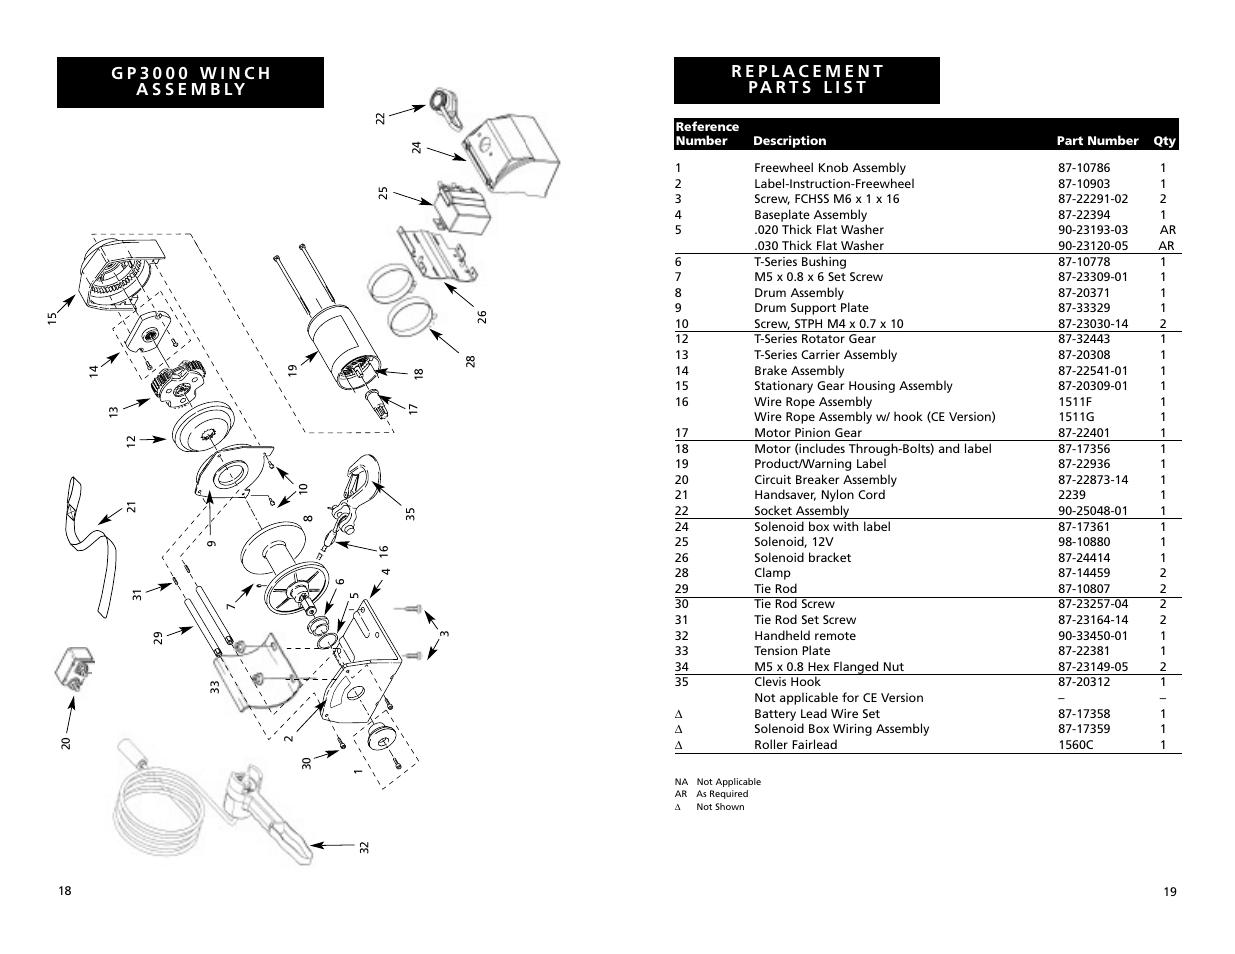 superwinch gp2300 1 043 kgs 12v user manual page 10 34 rh manualsdir com